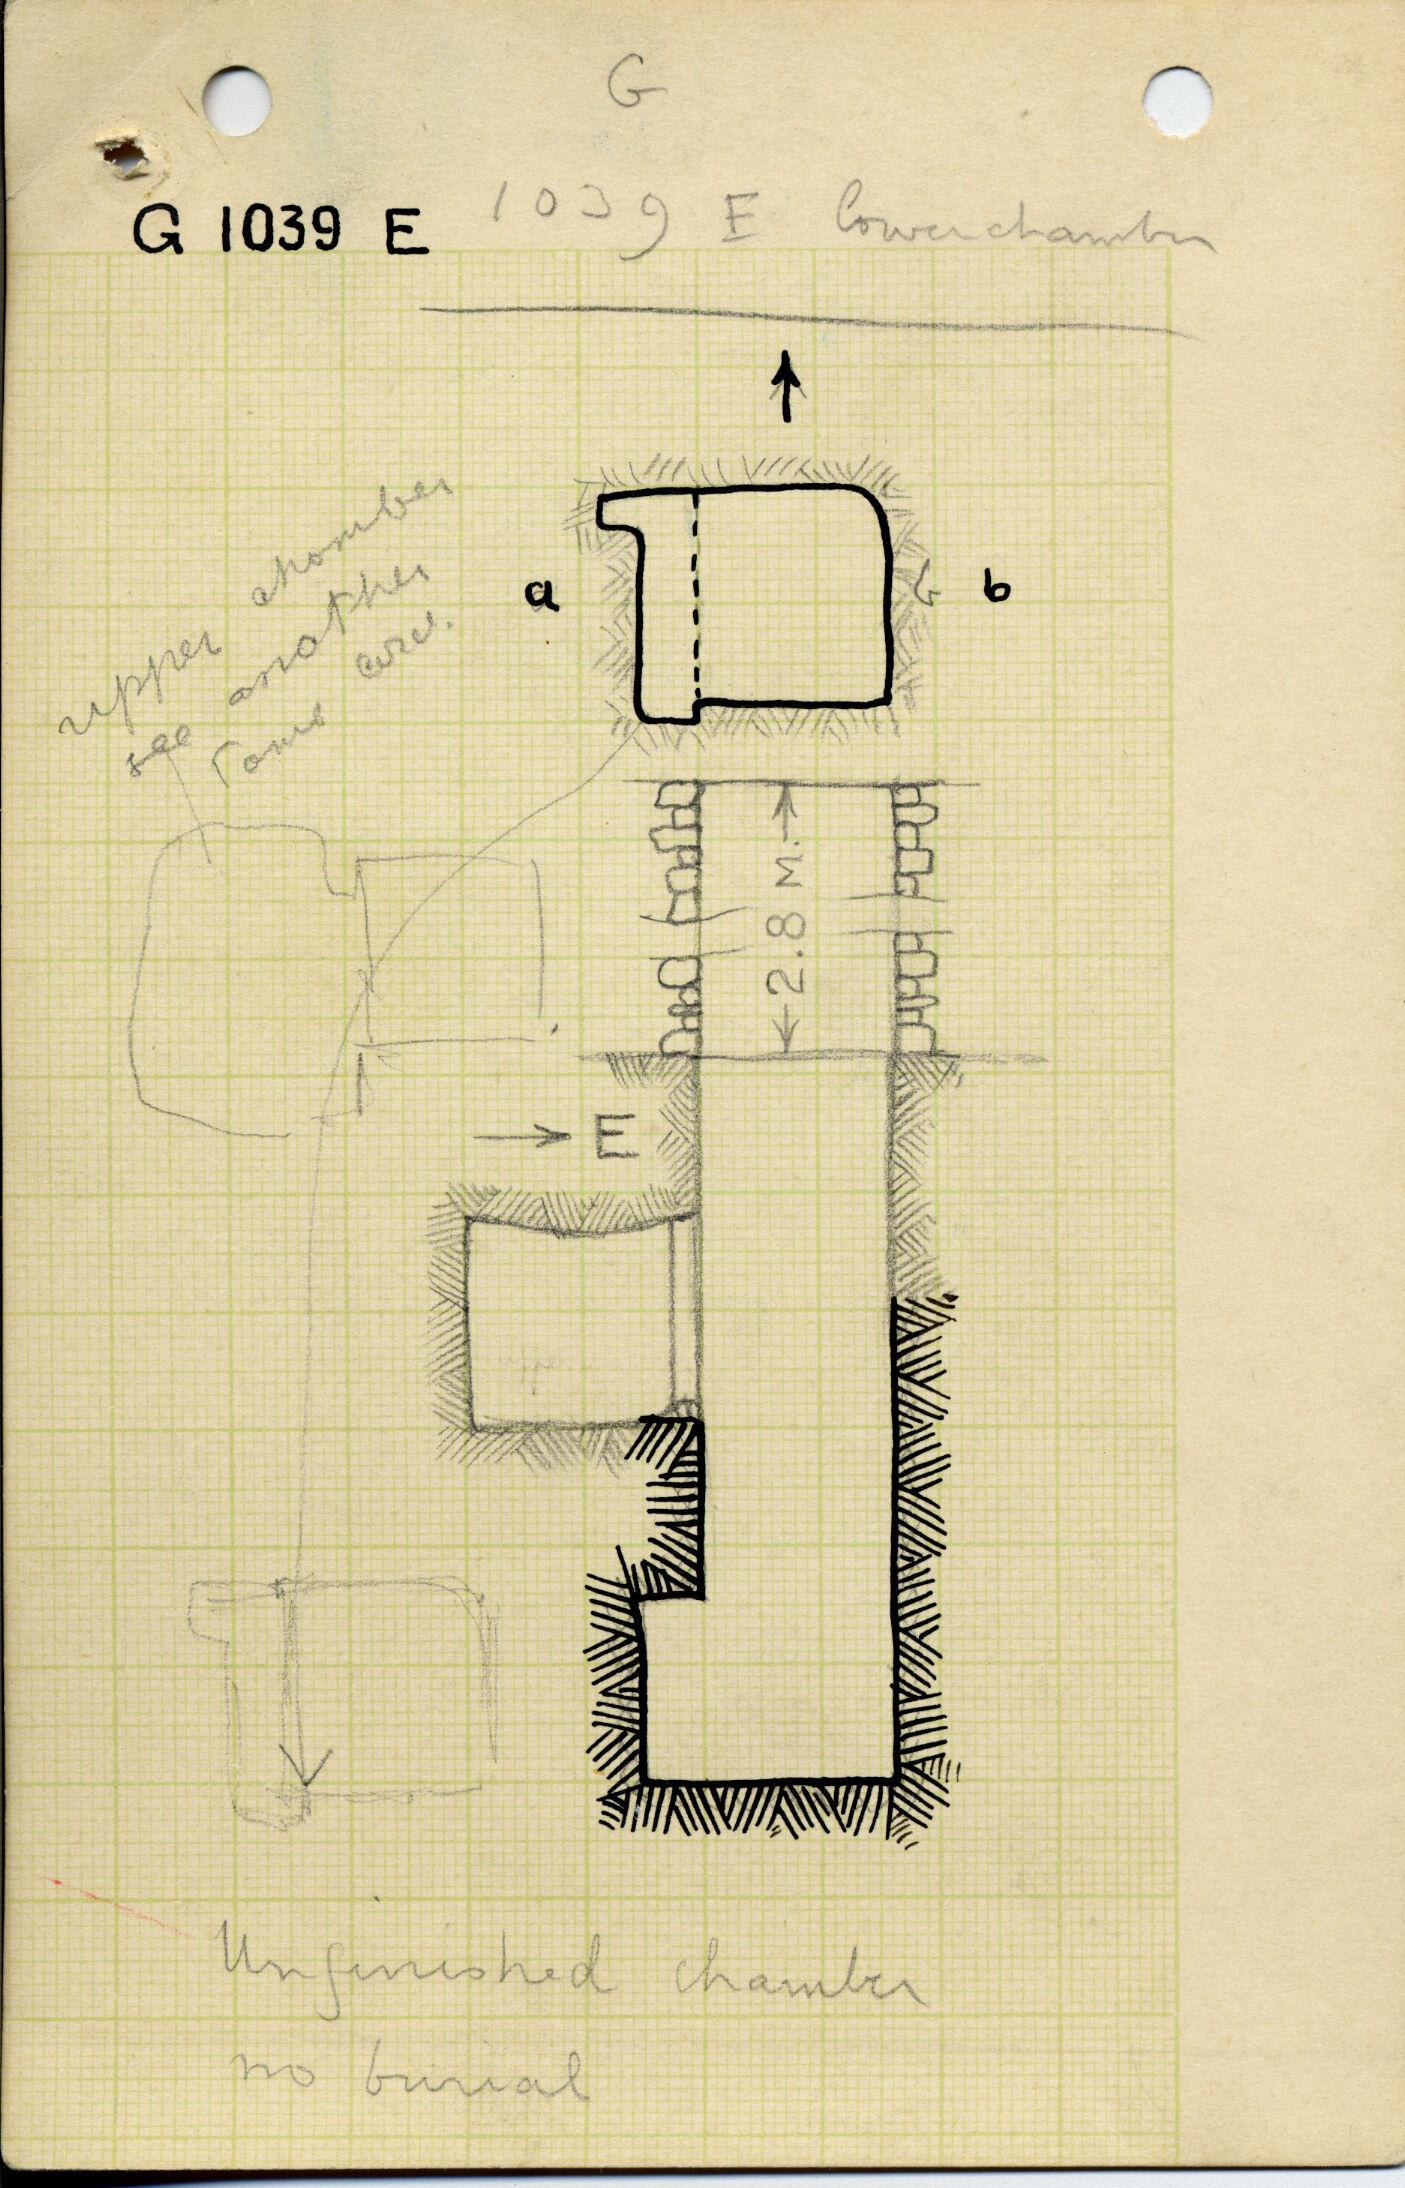 Maps and plans: G 1039, Shaft E (II)